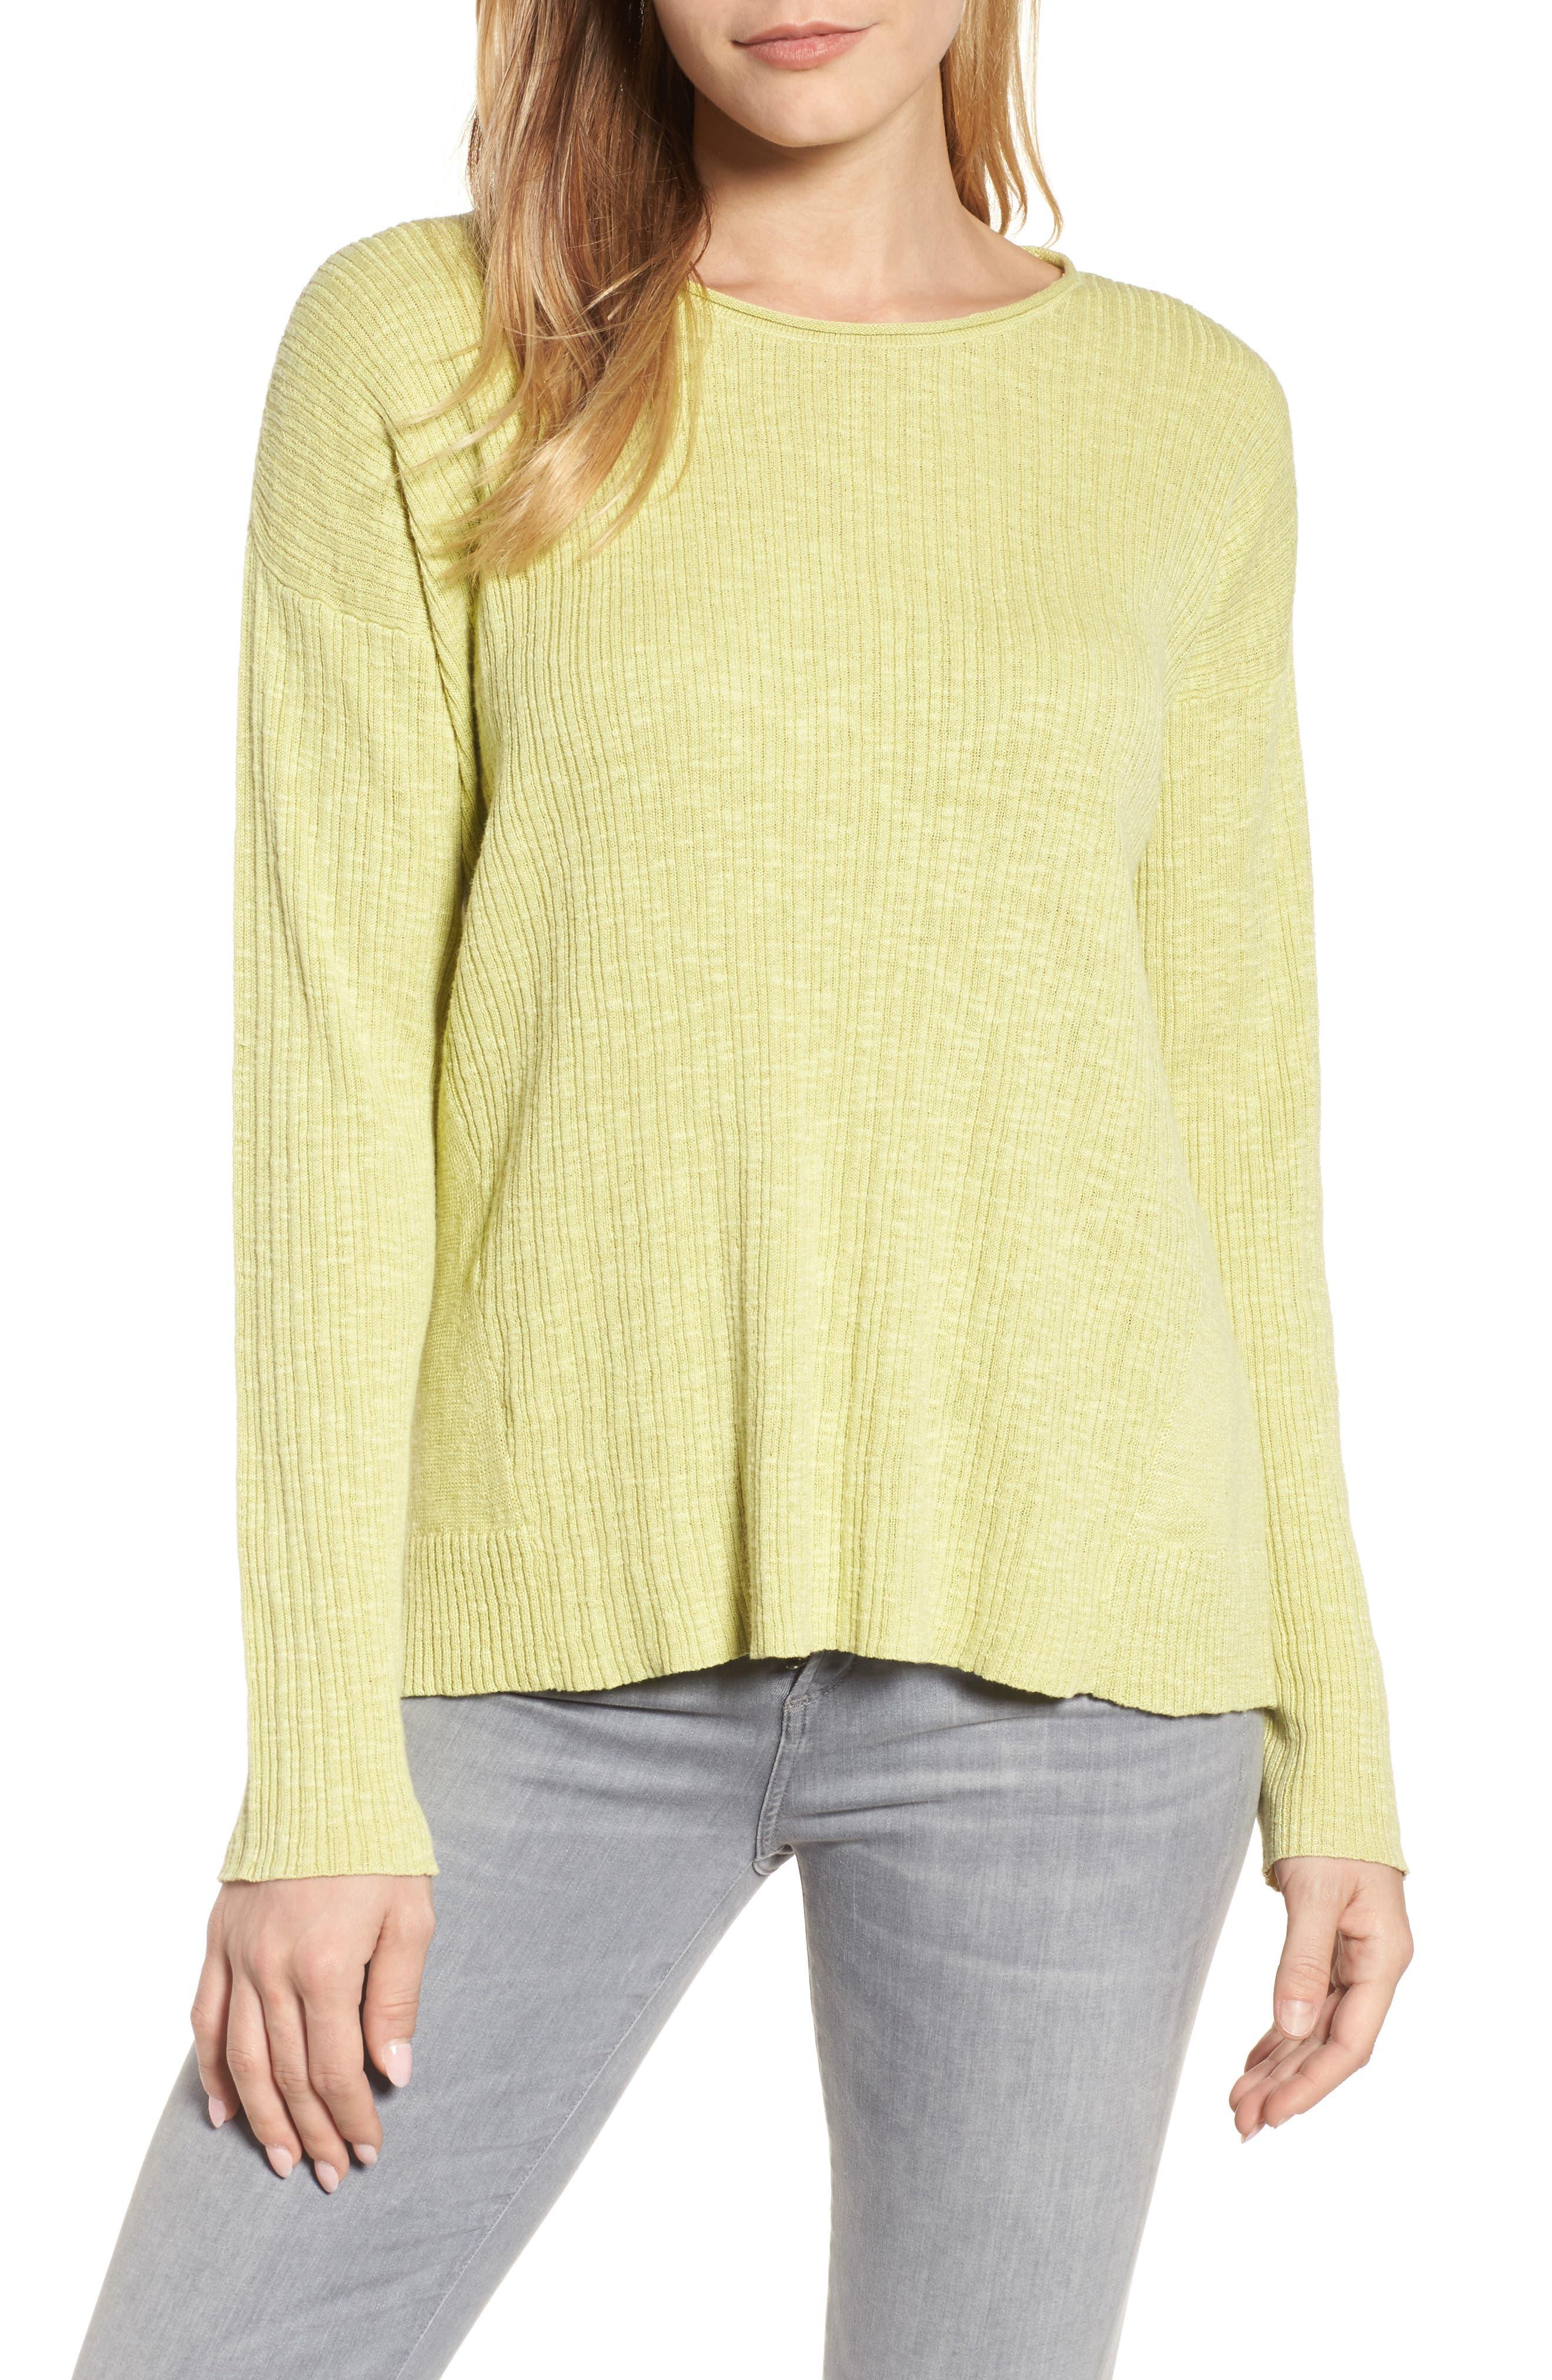 Alternate Image 1 Selected - Eileen Fisher Organic Linen & Cotton Crewneck Sweater (Regular & Petite)